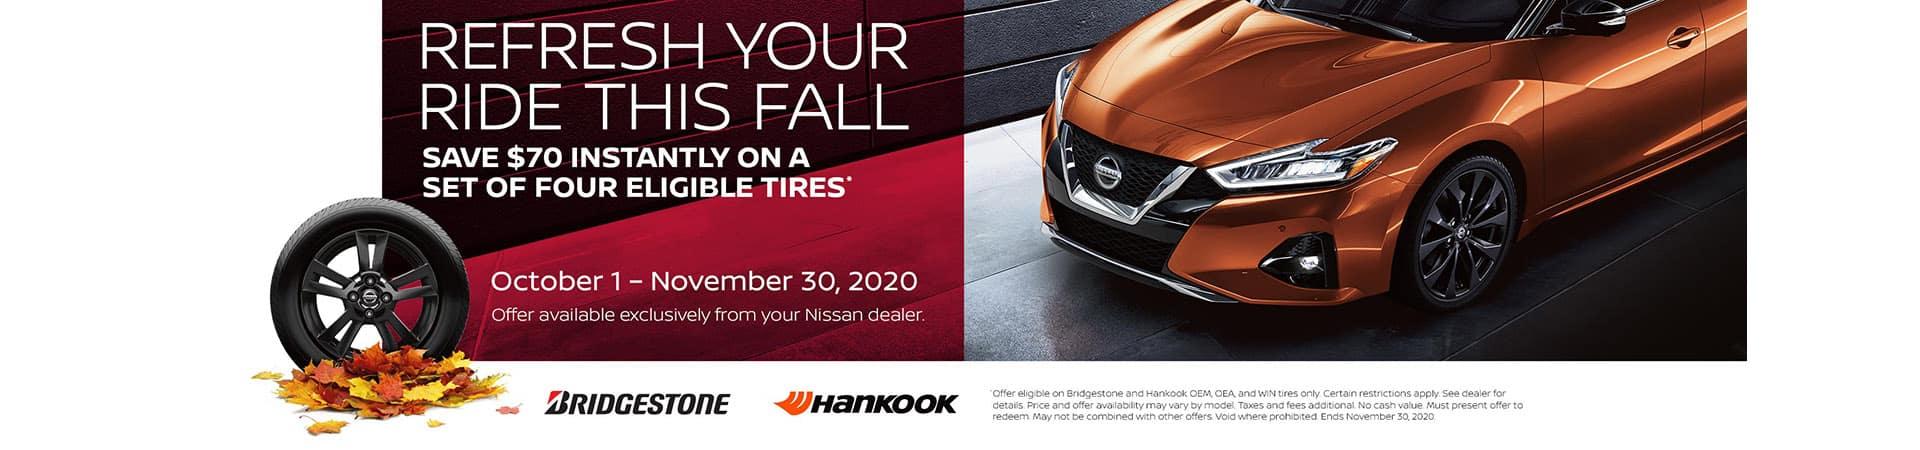 Nissan Tires Promo - Save $70